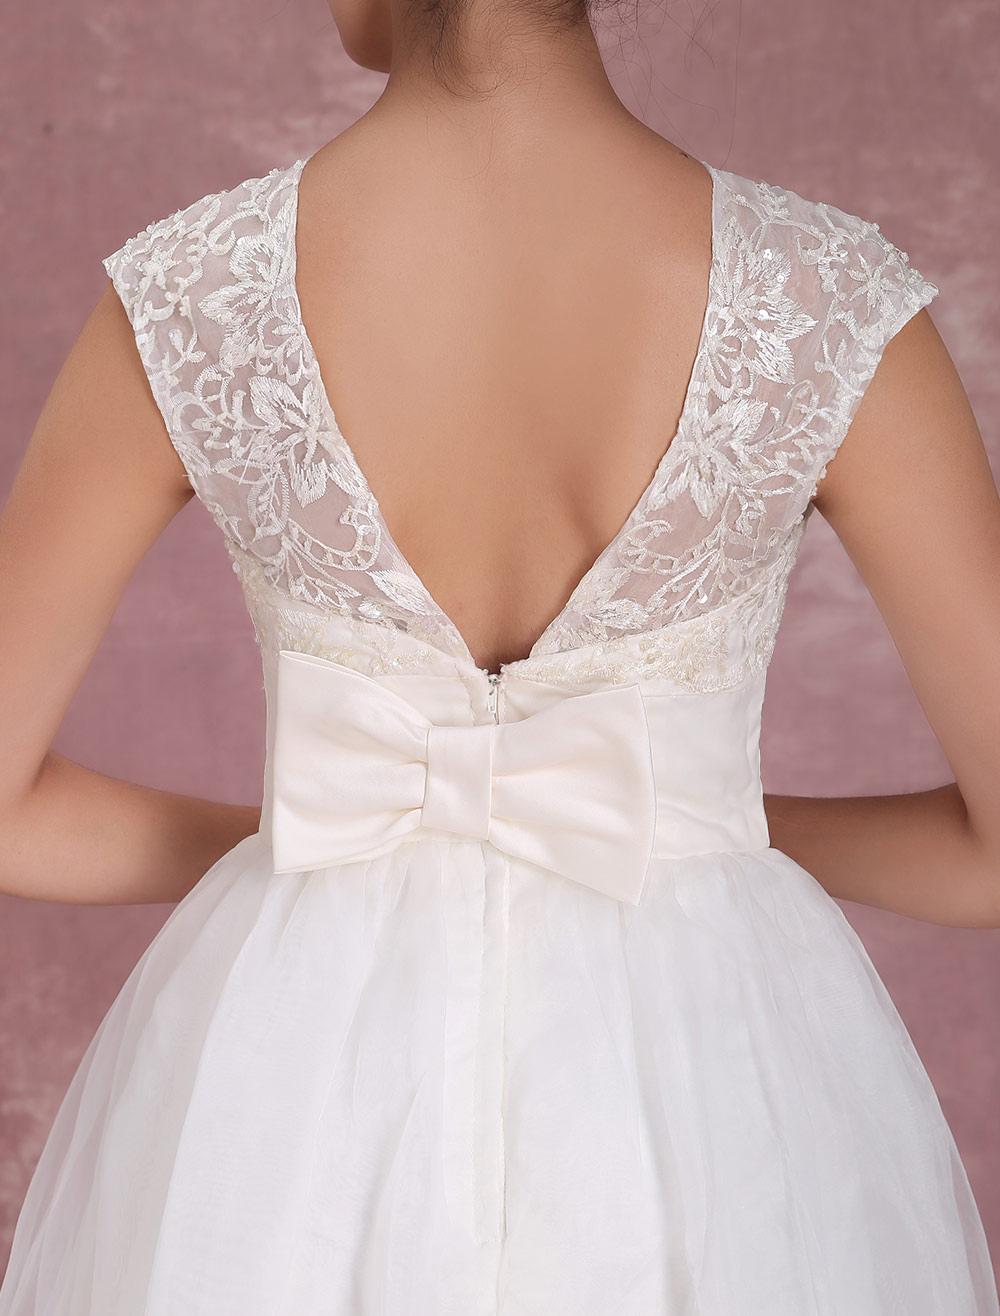 Milanoo / Elegant Net Round Neck Mini Wedding Dress